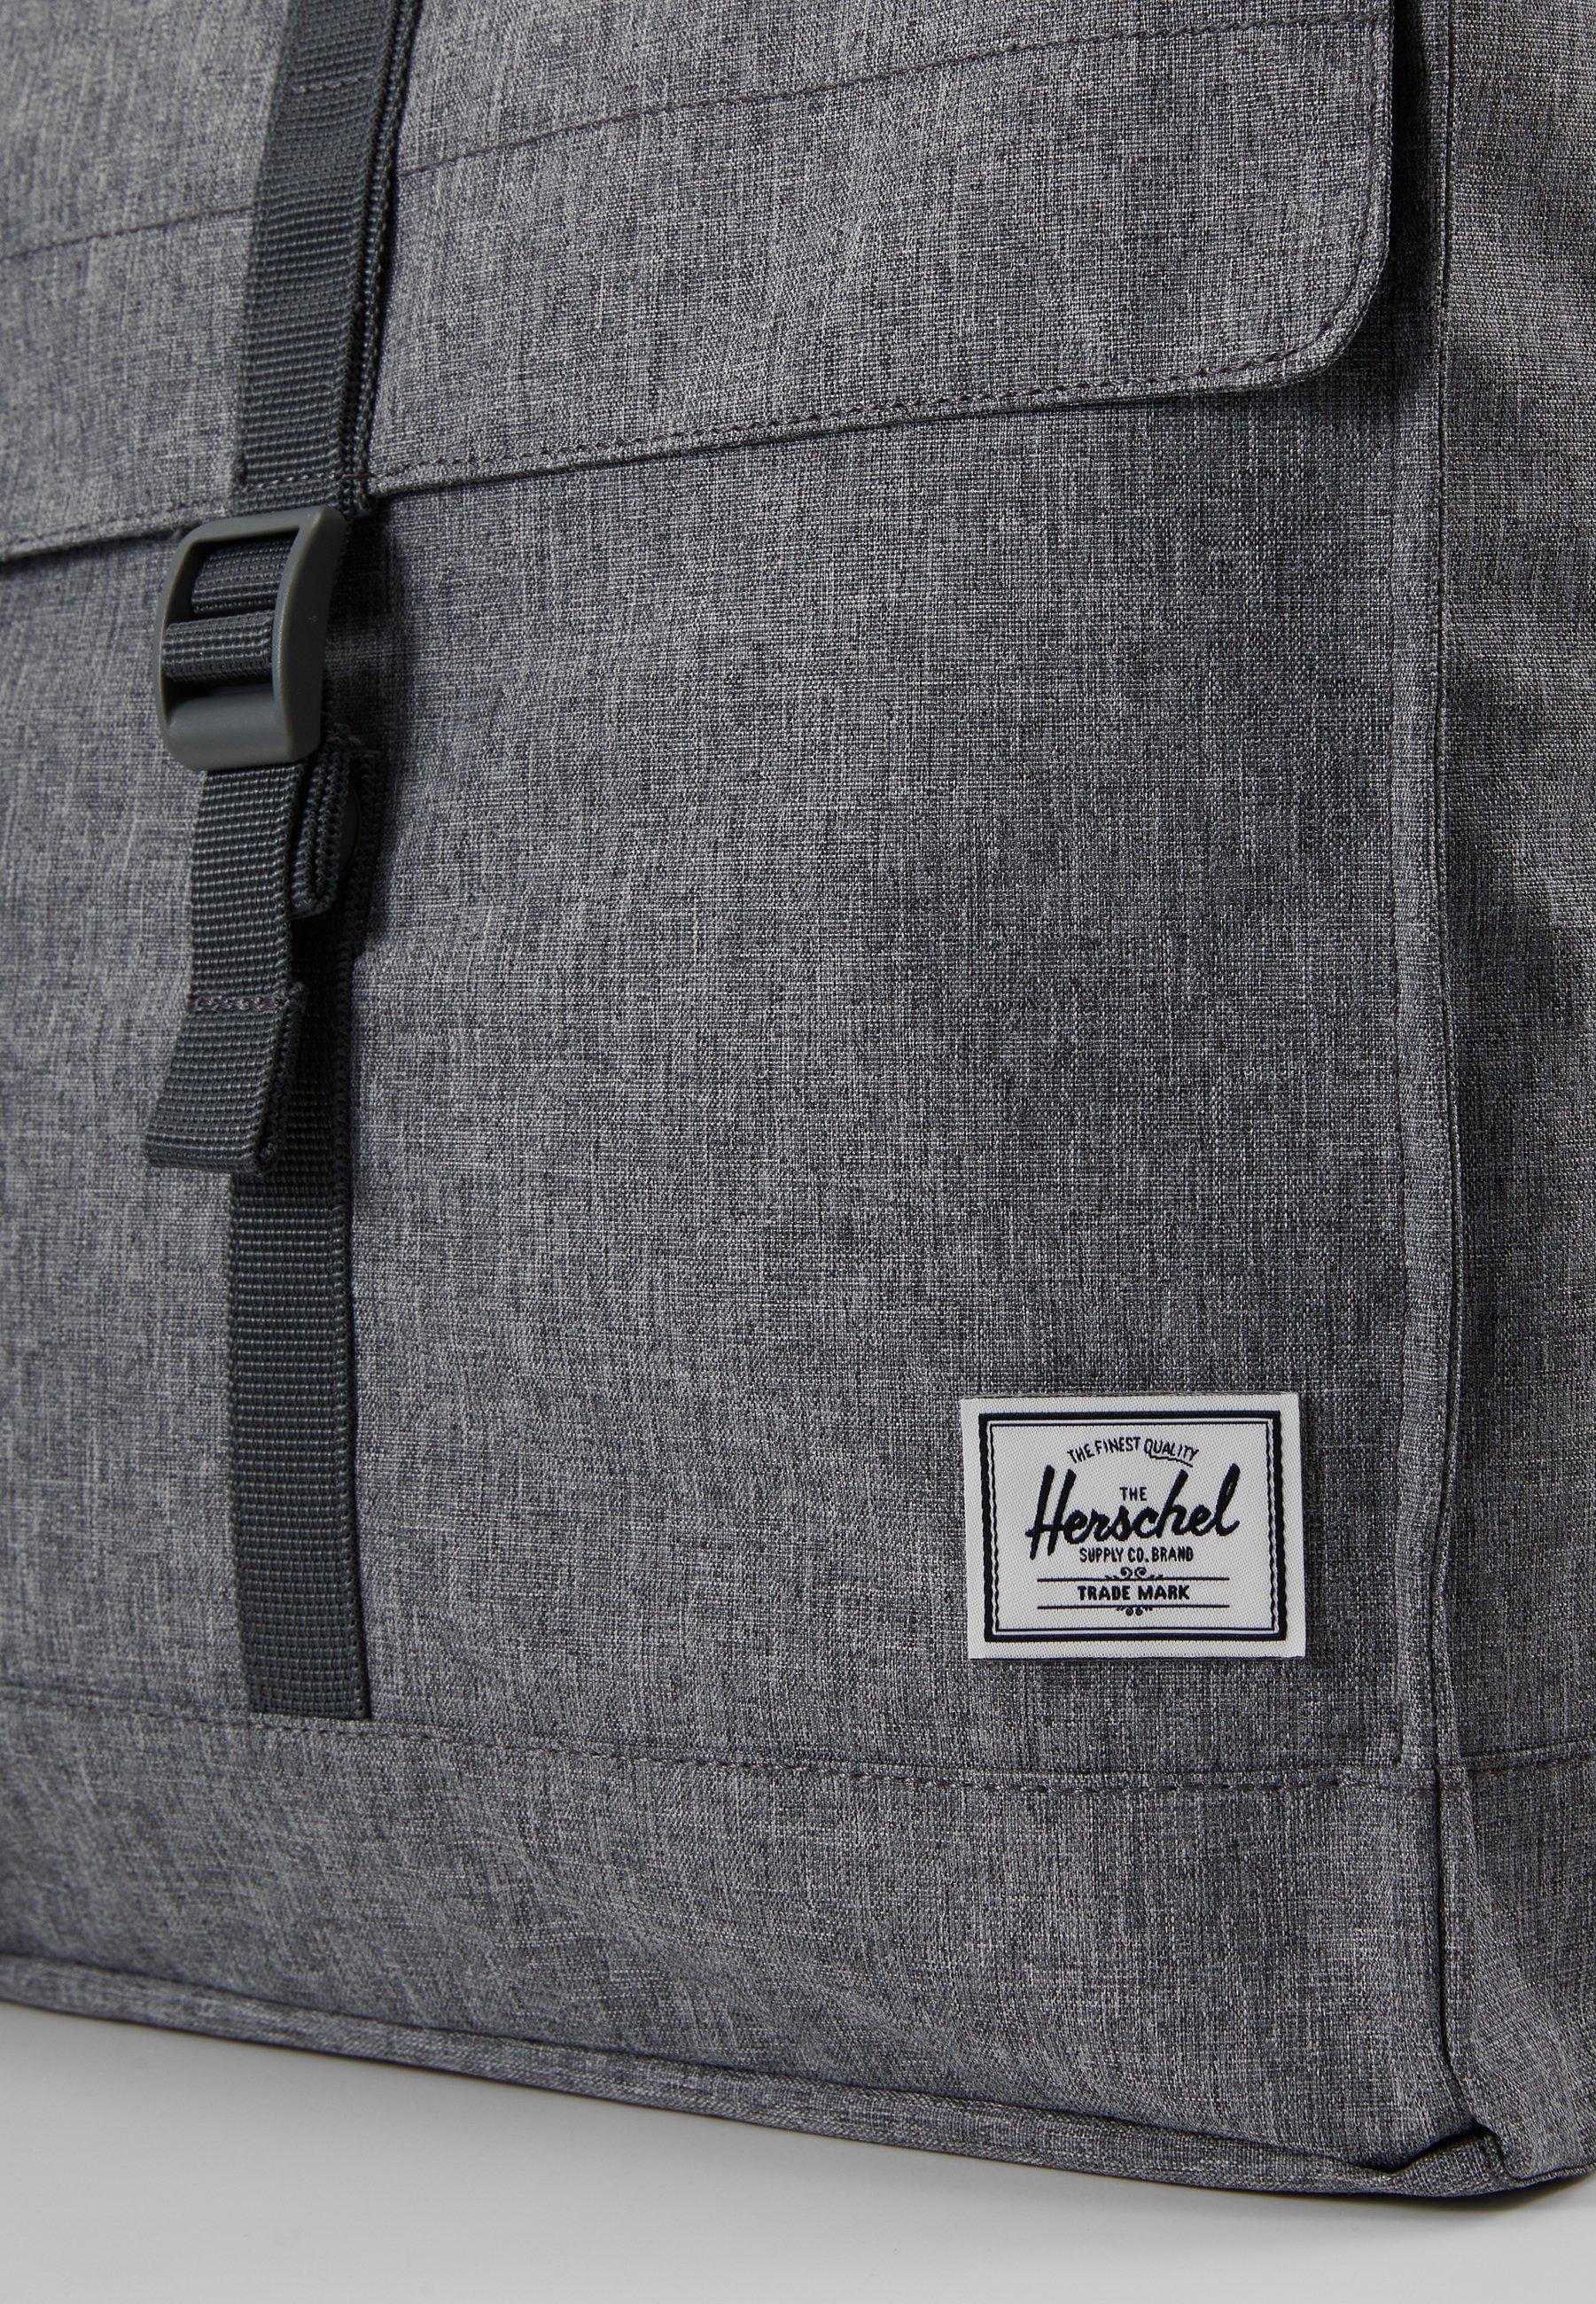 Herschel CITY MID VOLUME - Tagesrucksack - raven crosshatch/dunkelgrau-meliert - Herrentaschen HYadK